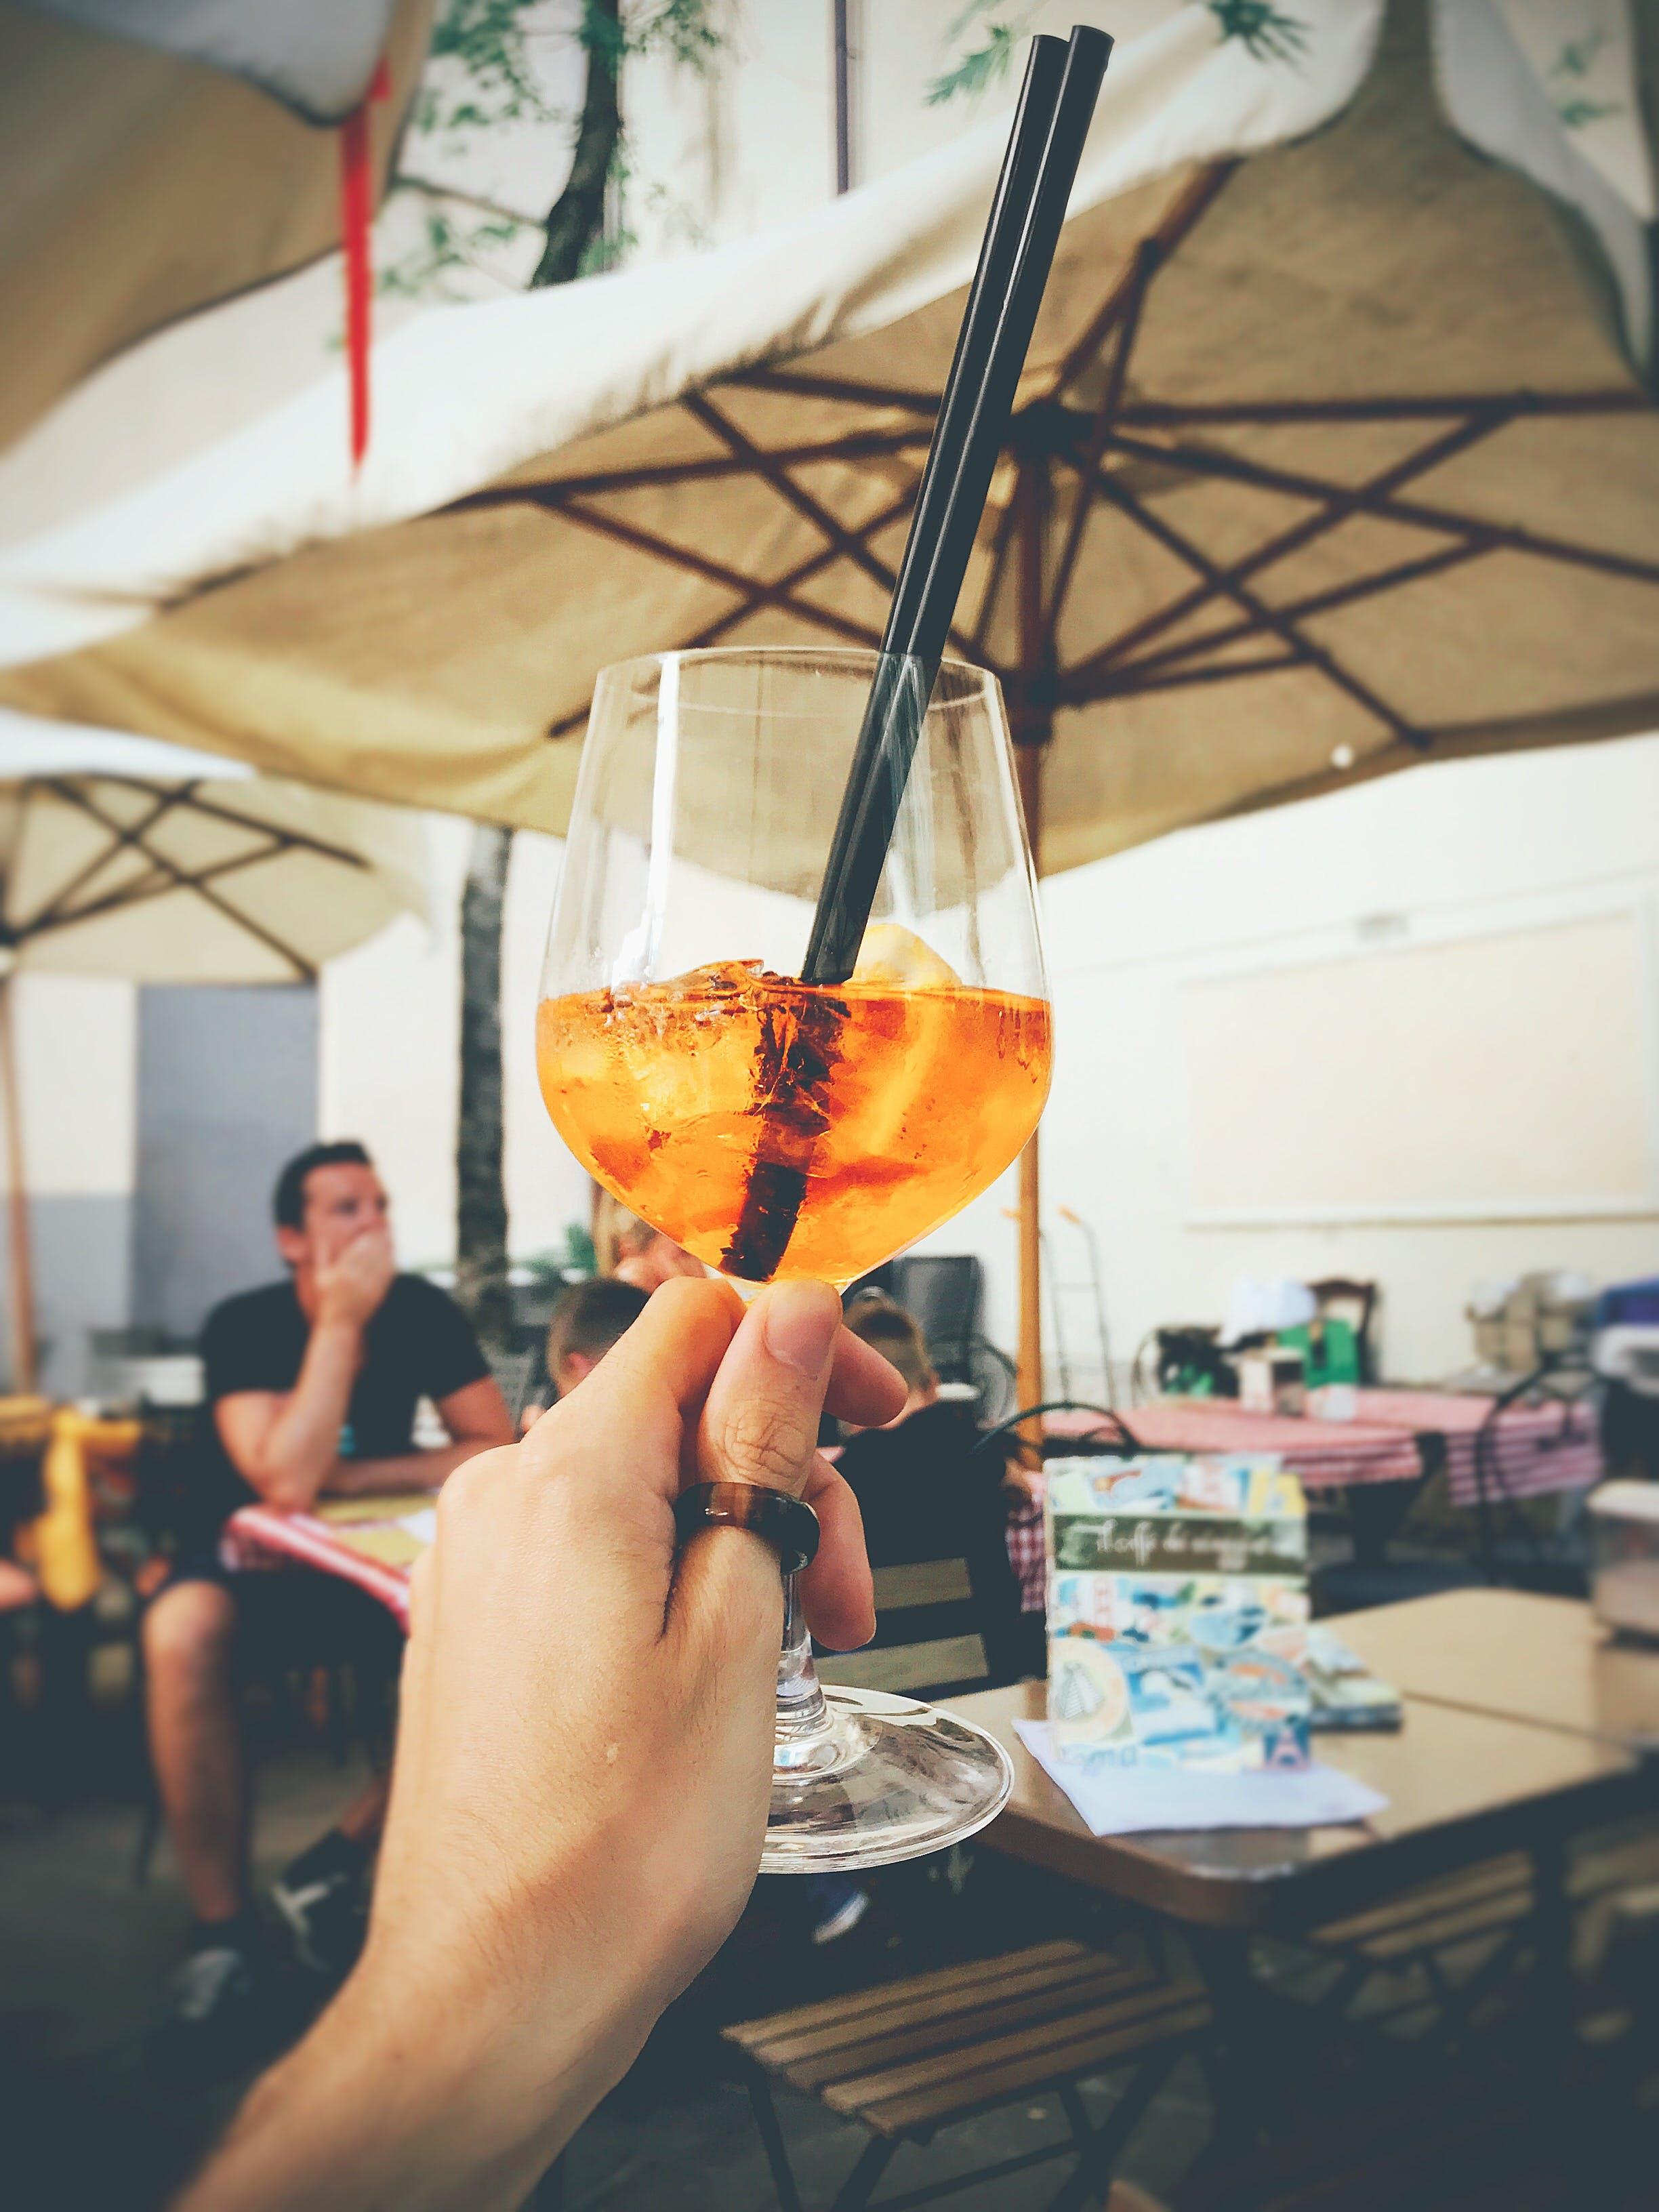 Foto stok gratis gelas anggur, gelas minum, mobilechallenge, Sedotan